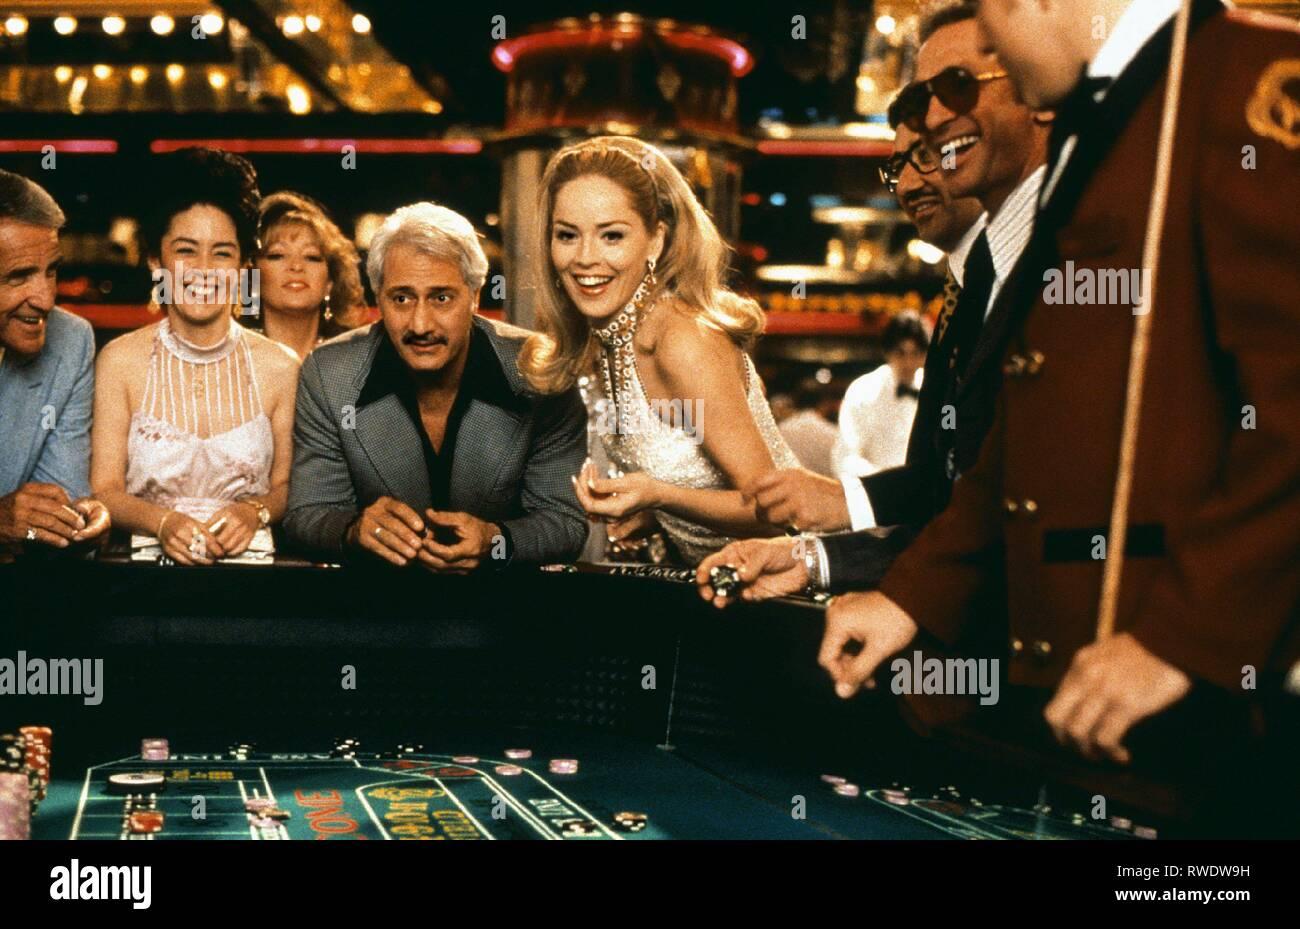 Casino 1995 Sharon Stone Imágenes De Stock Casino 1995